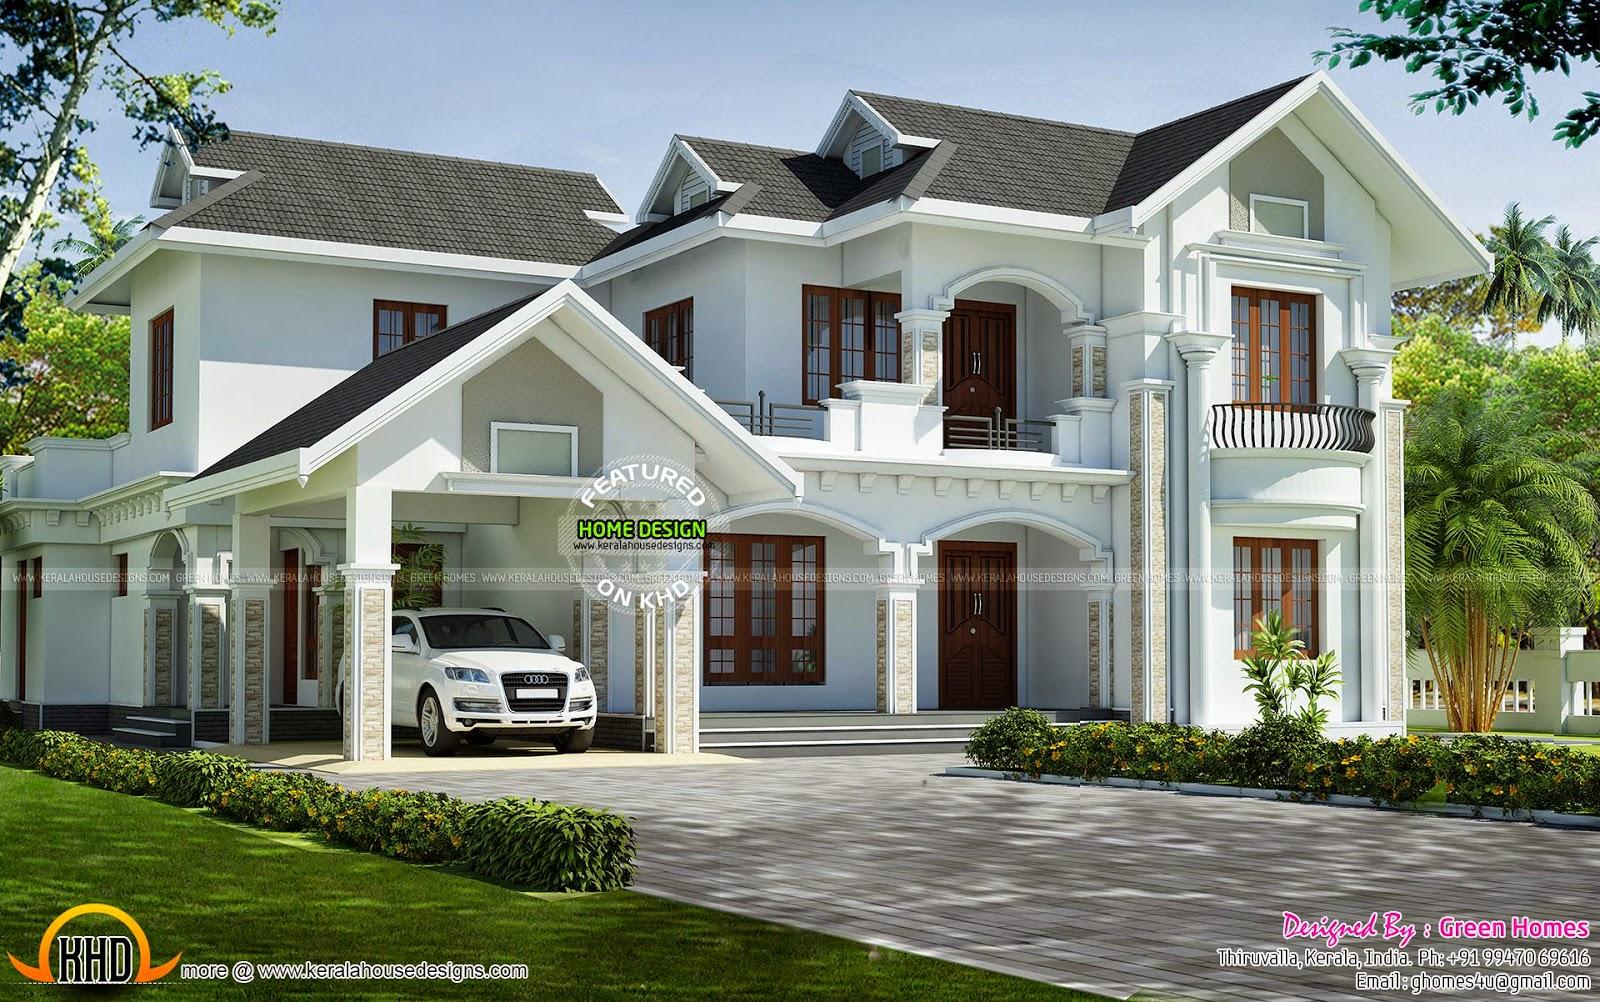 dream house design kerala model dream house kerala home design and floor plans - My Dream Home Design